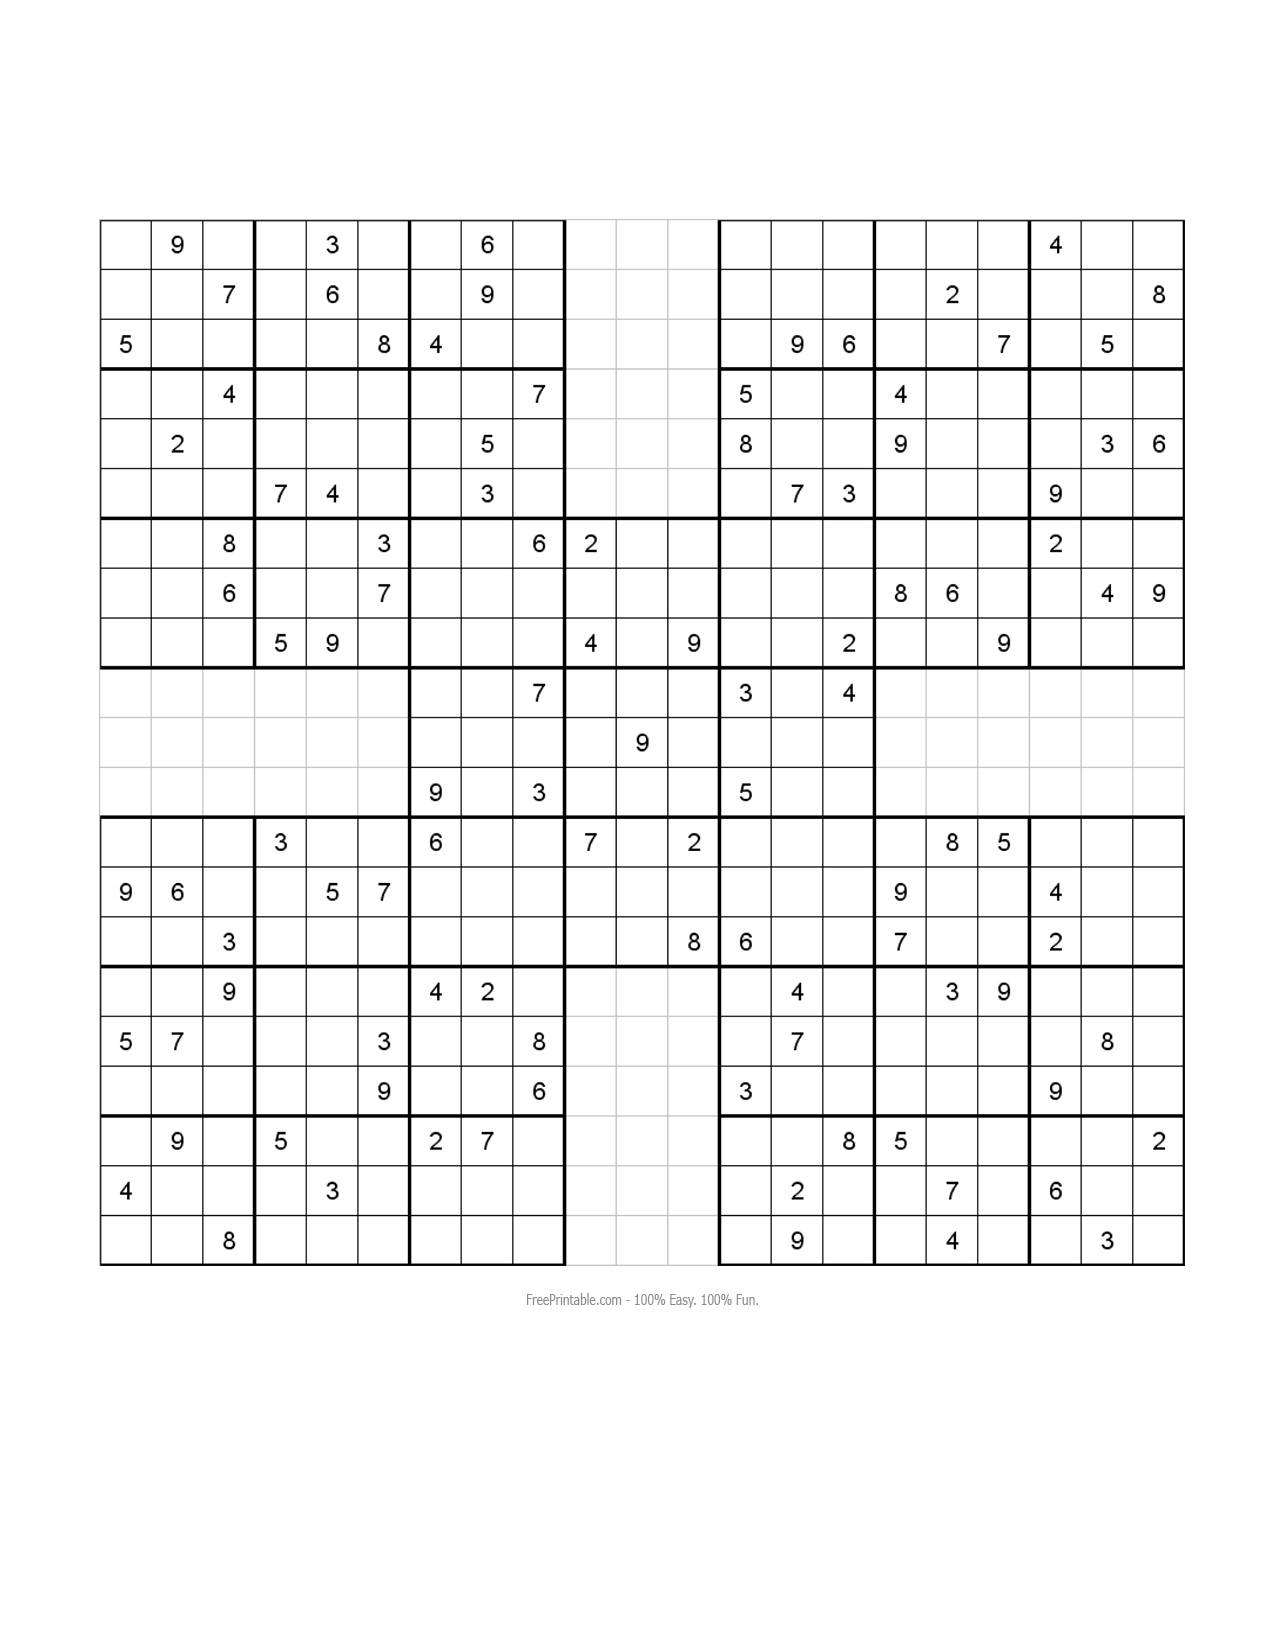 Single minded expert crossword clue